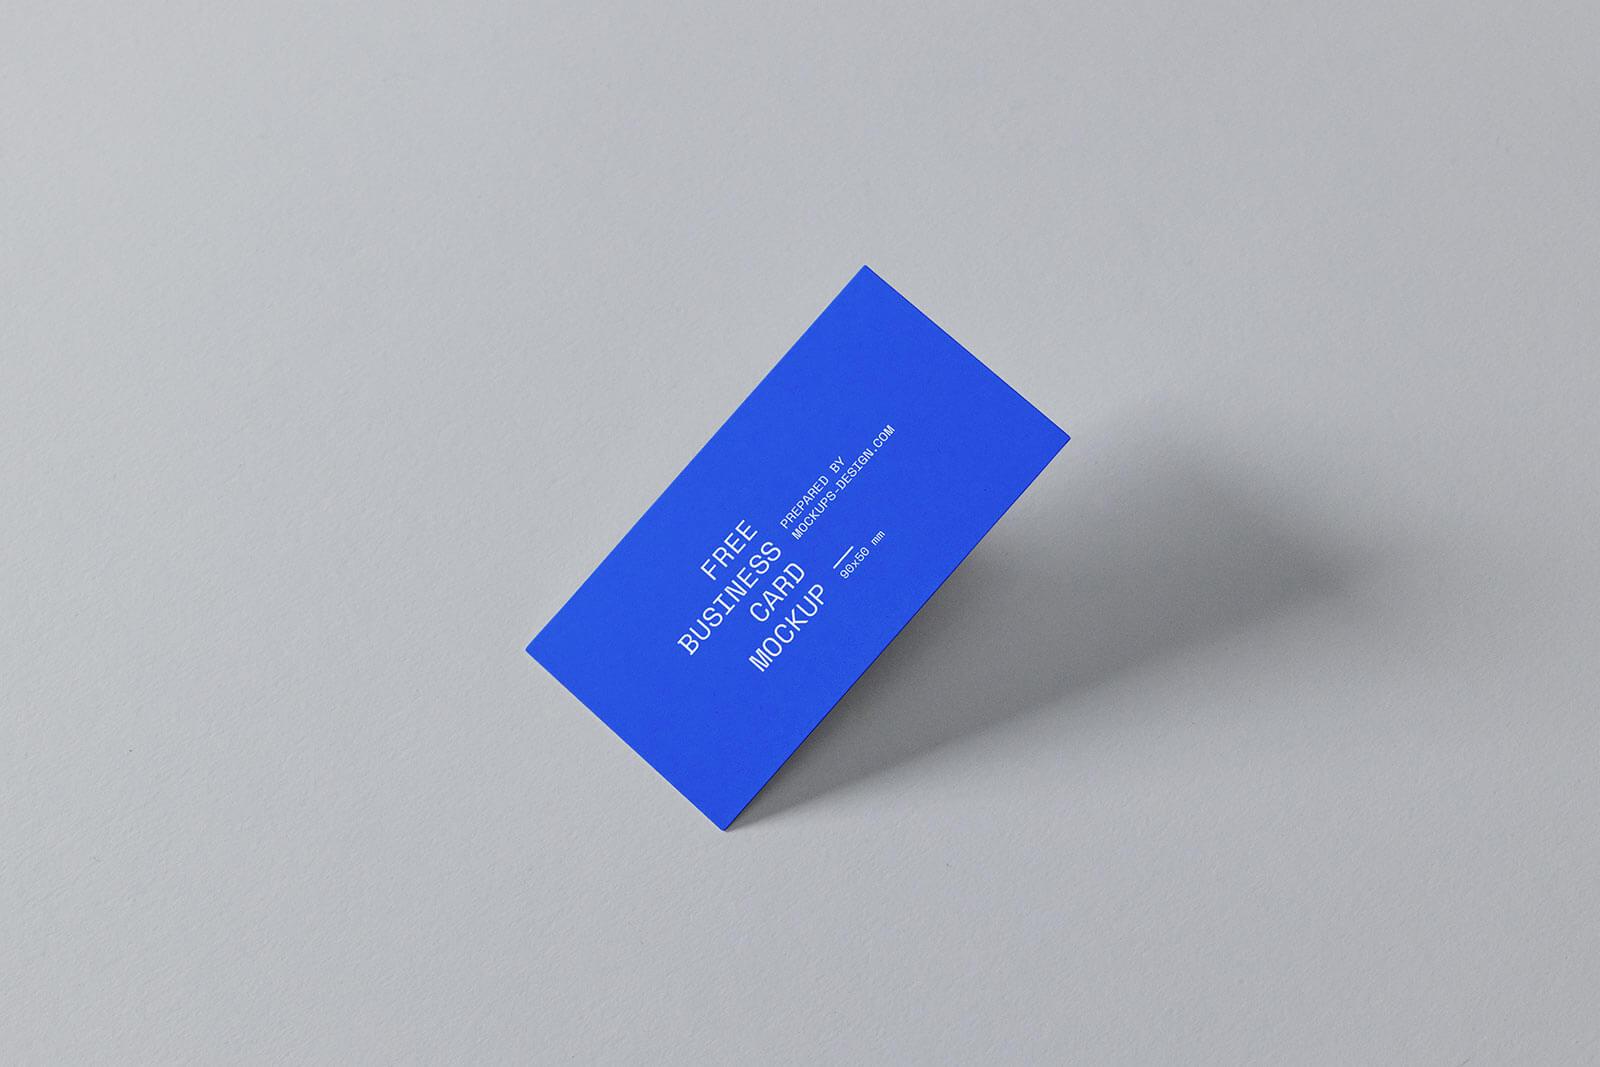 90 x 50 mm Business Card Mockup